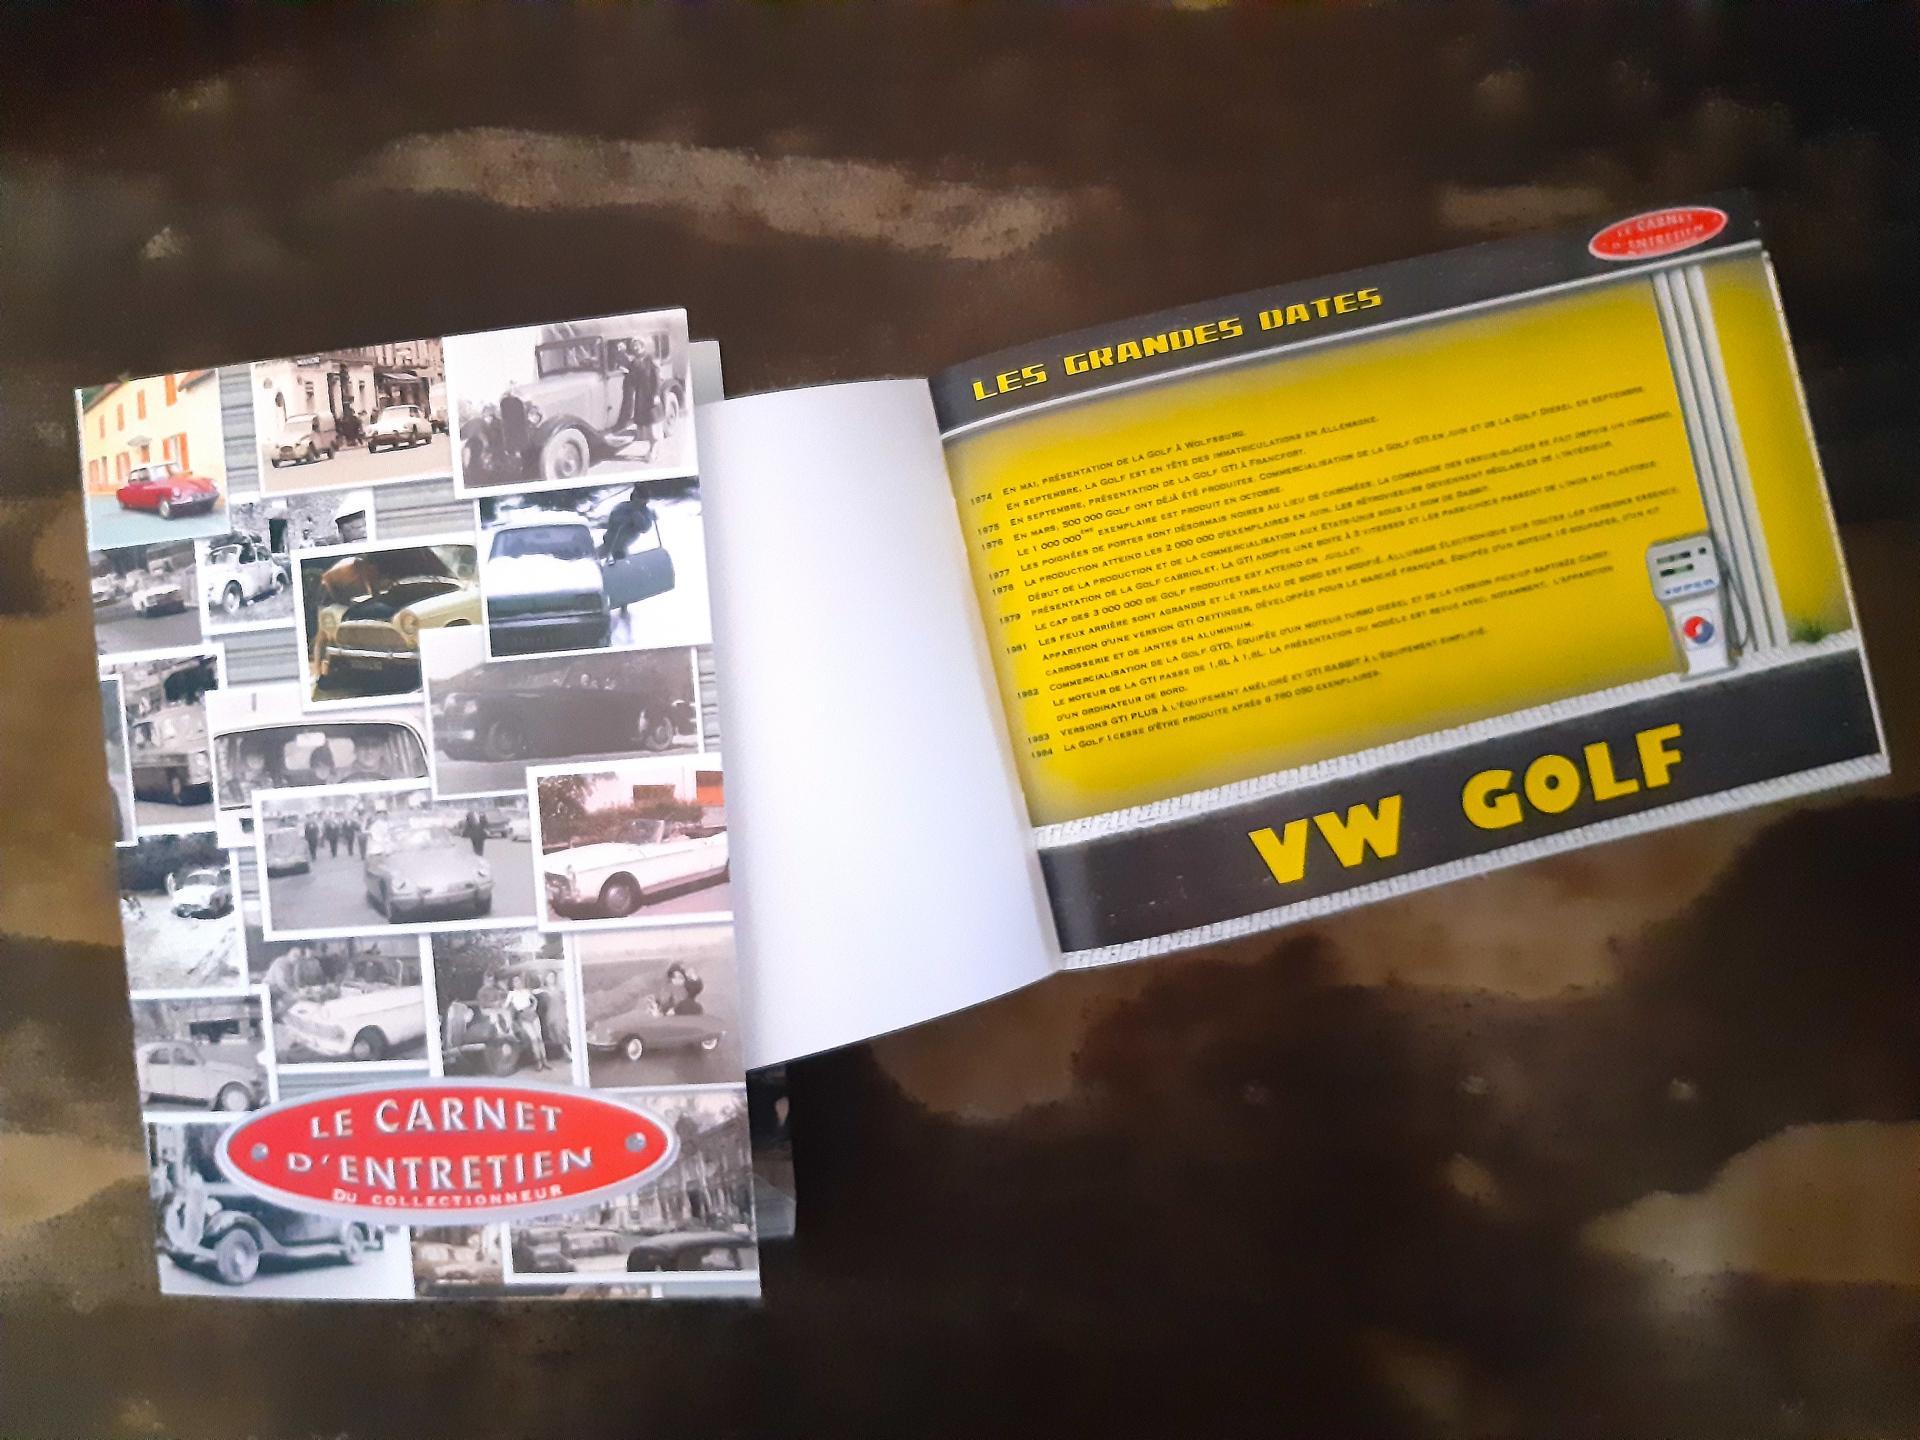 carnet d'entretien golf